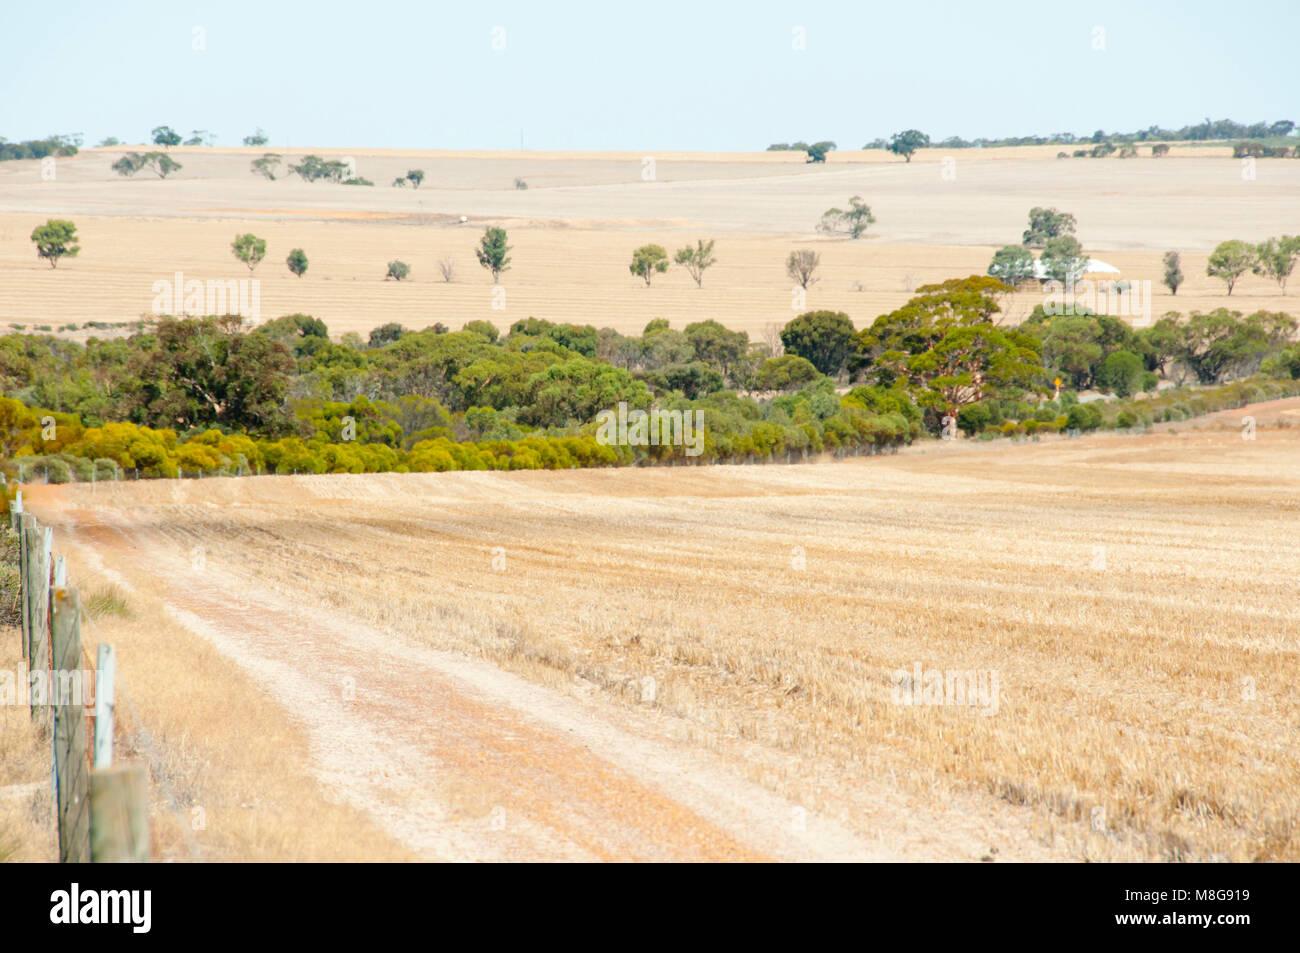 Harvested Wheat Fields - Australia - Stock Image